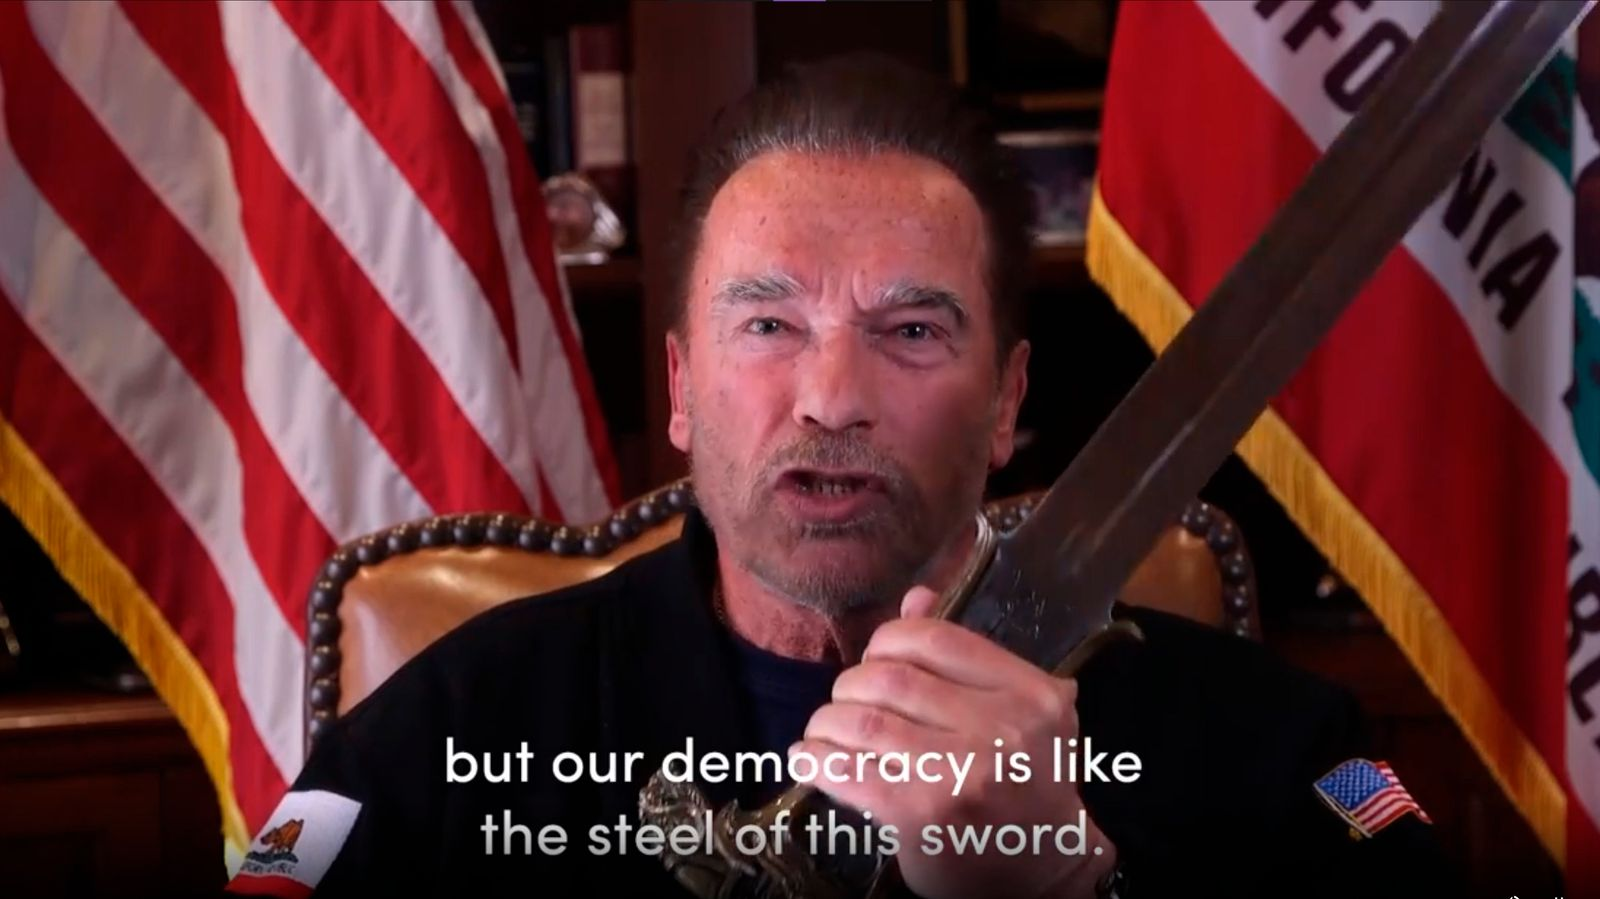 Capitol-Breach-Schwarzenegger Video